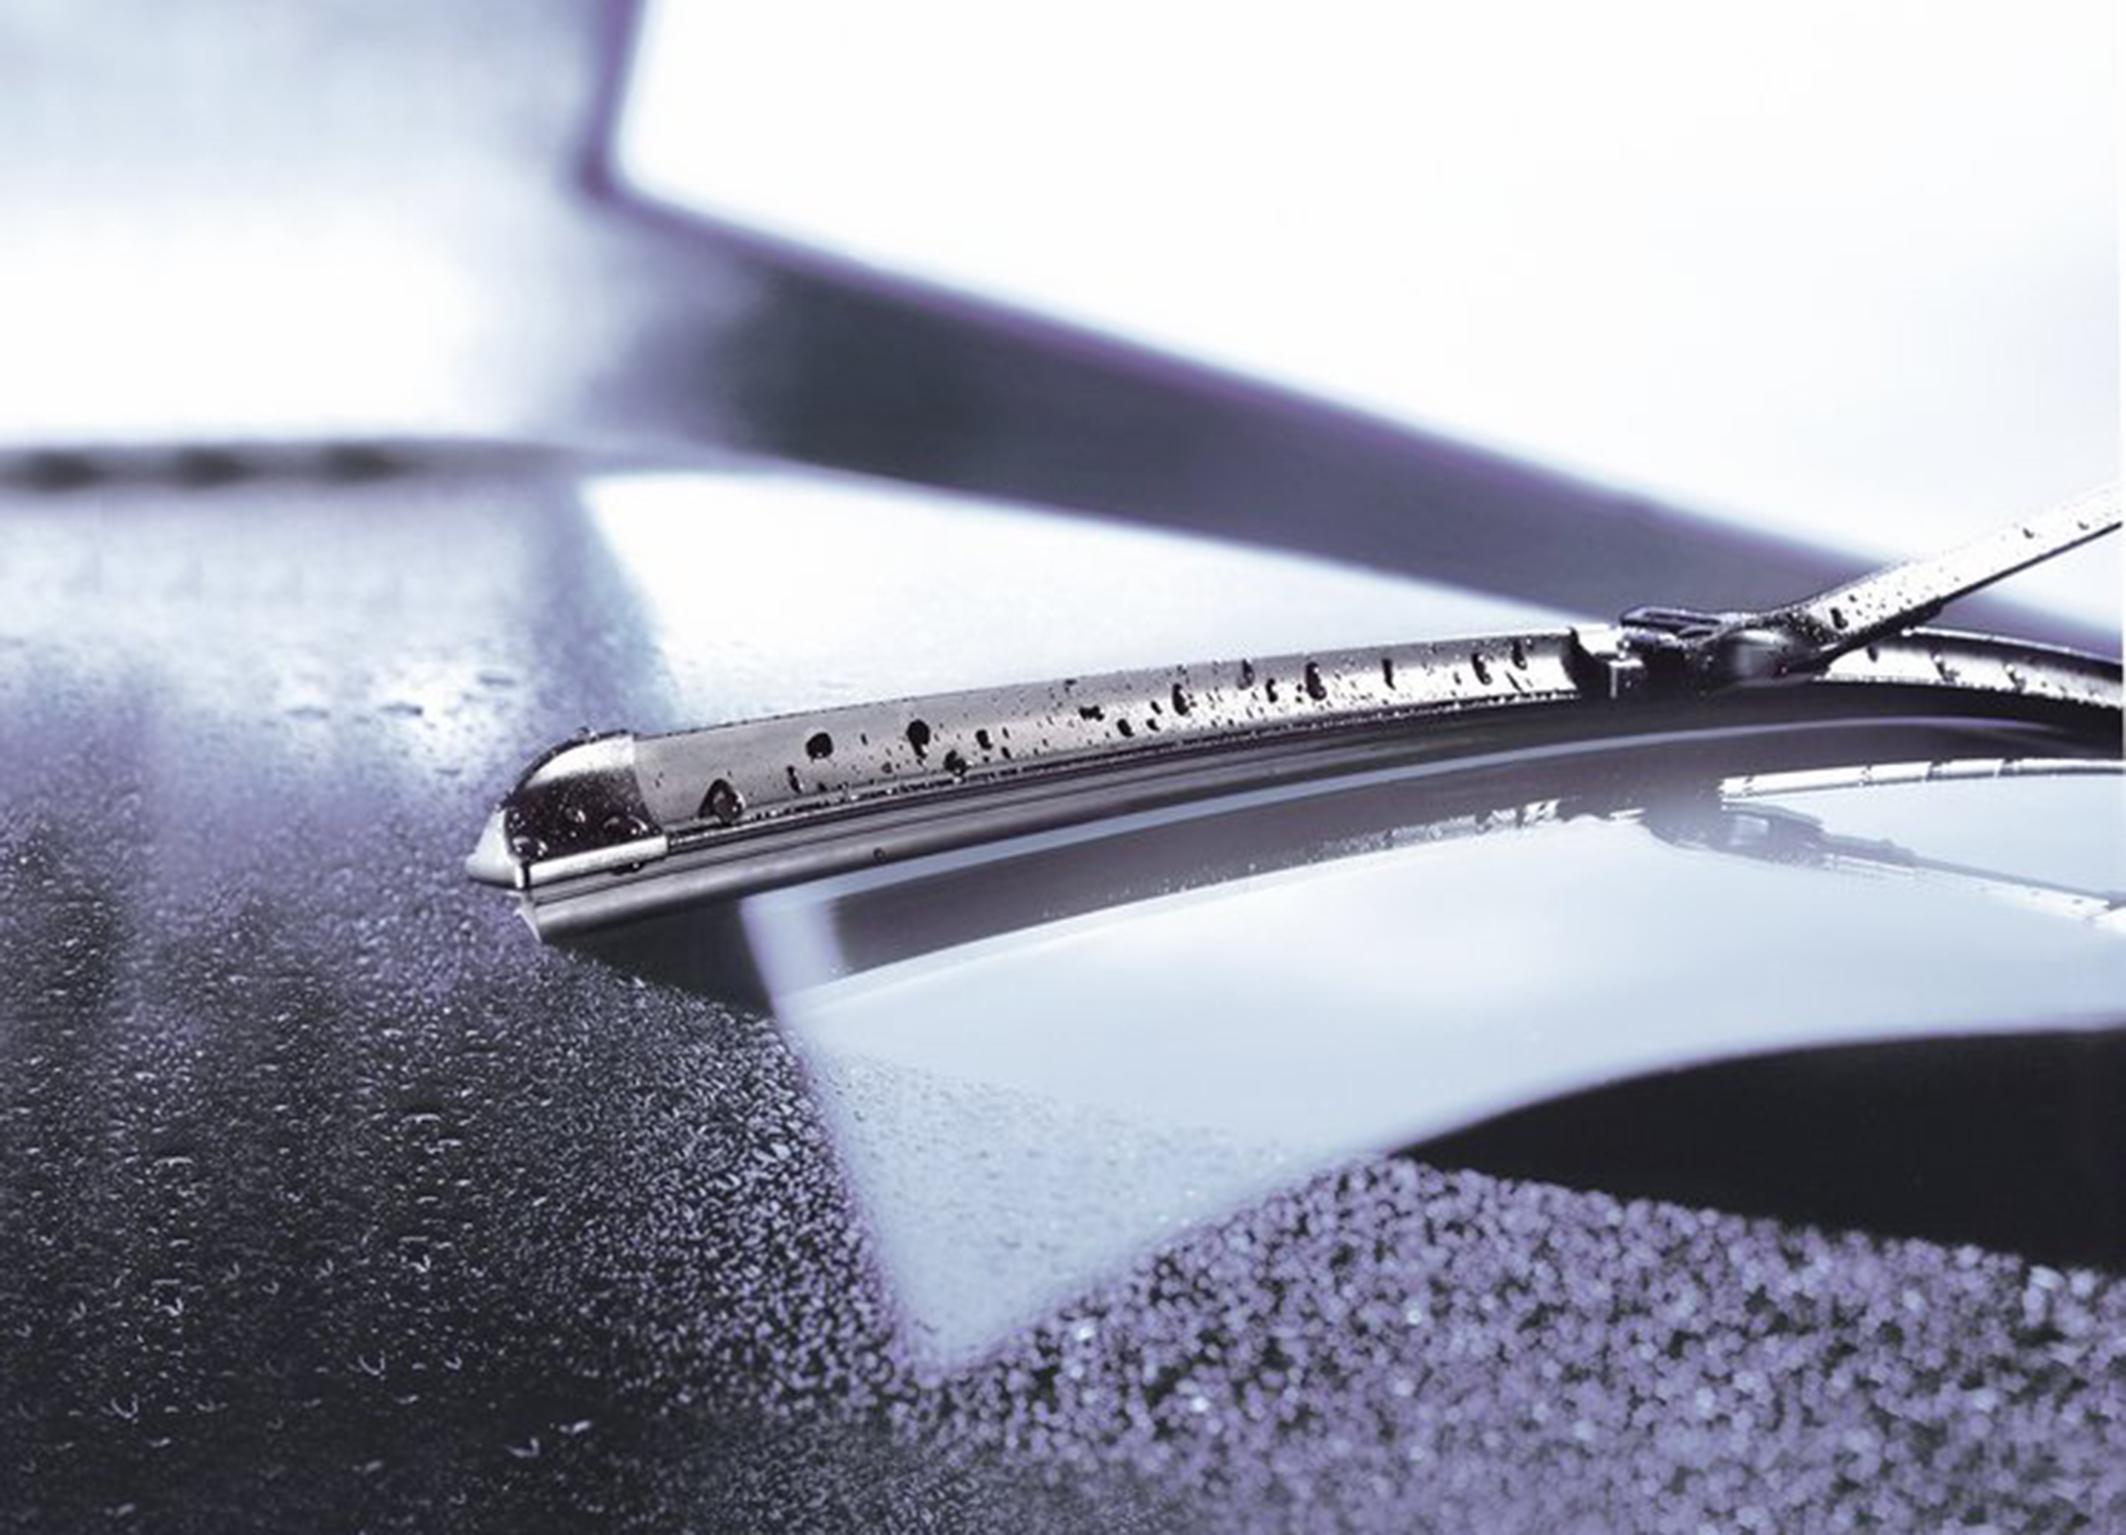 Balai d'essuie-glaces Bosch Endurance (E13 à E80)